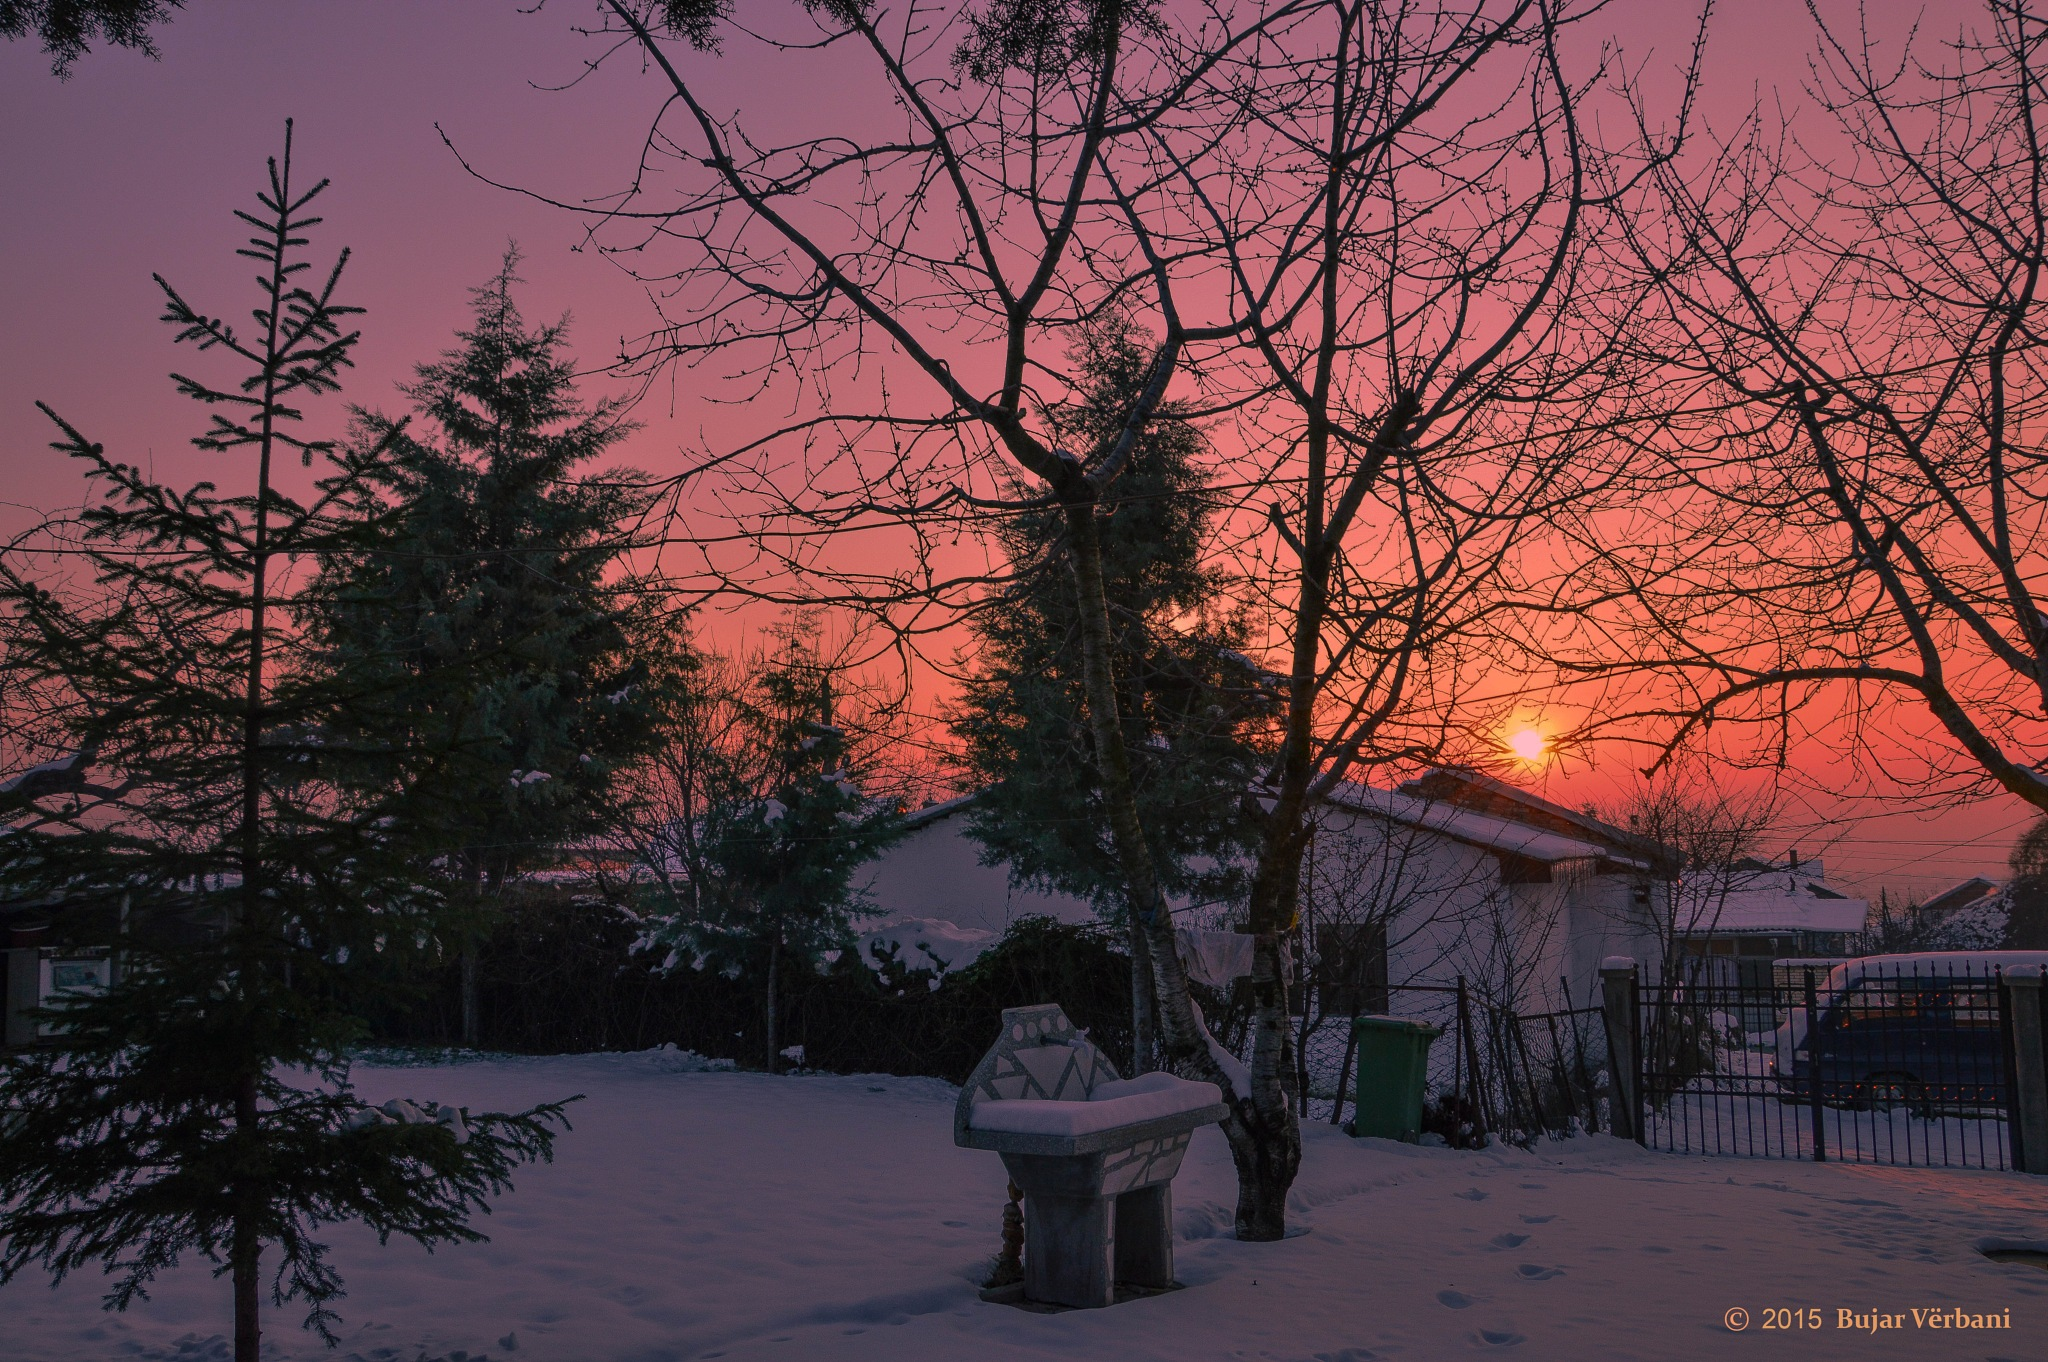 Sunset  in Winter by Bujar Vërbani